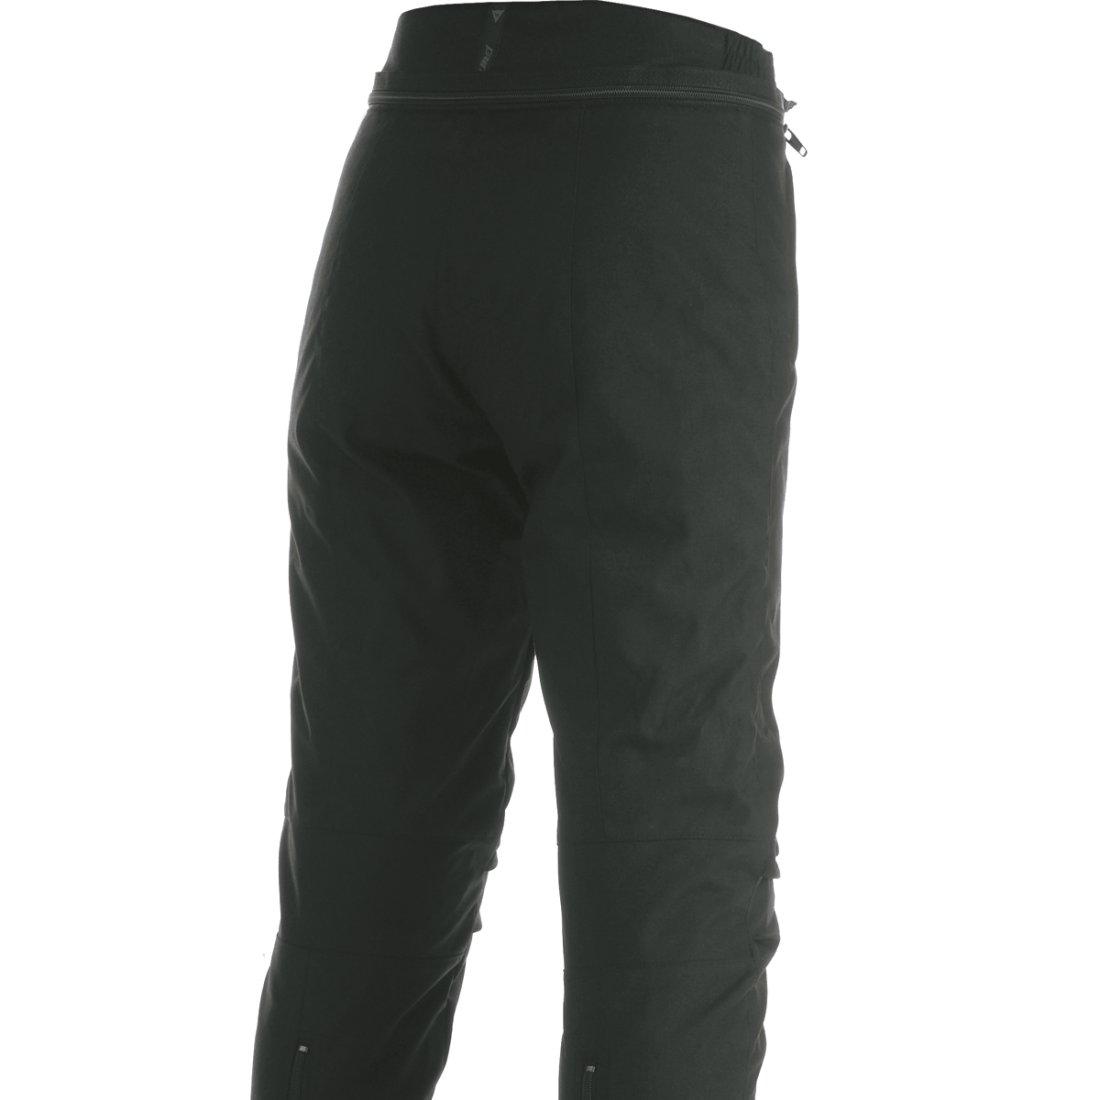 Pantalon dainese amsterdam lady black motocard for Amsterdam products